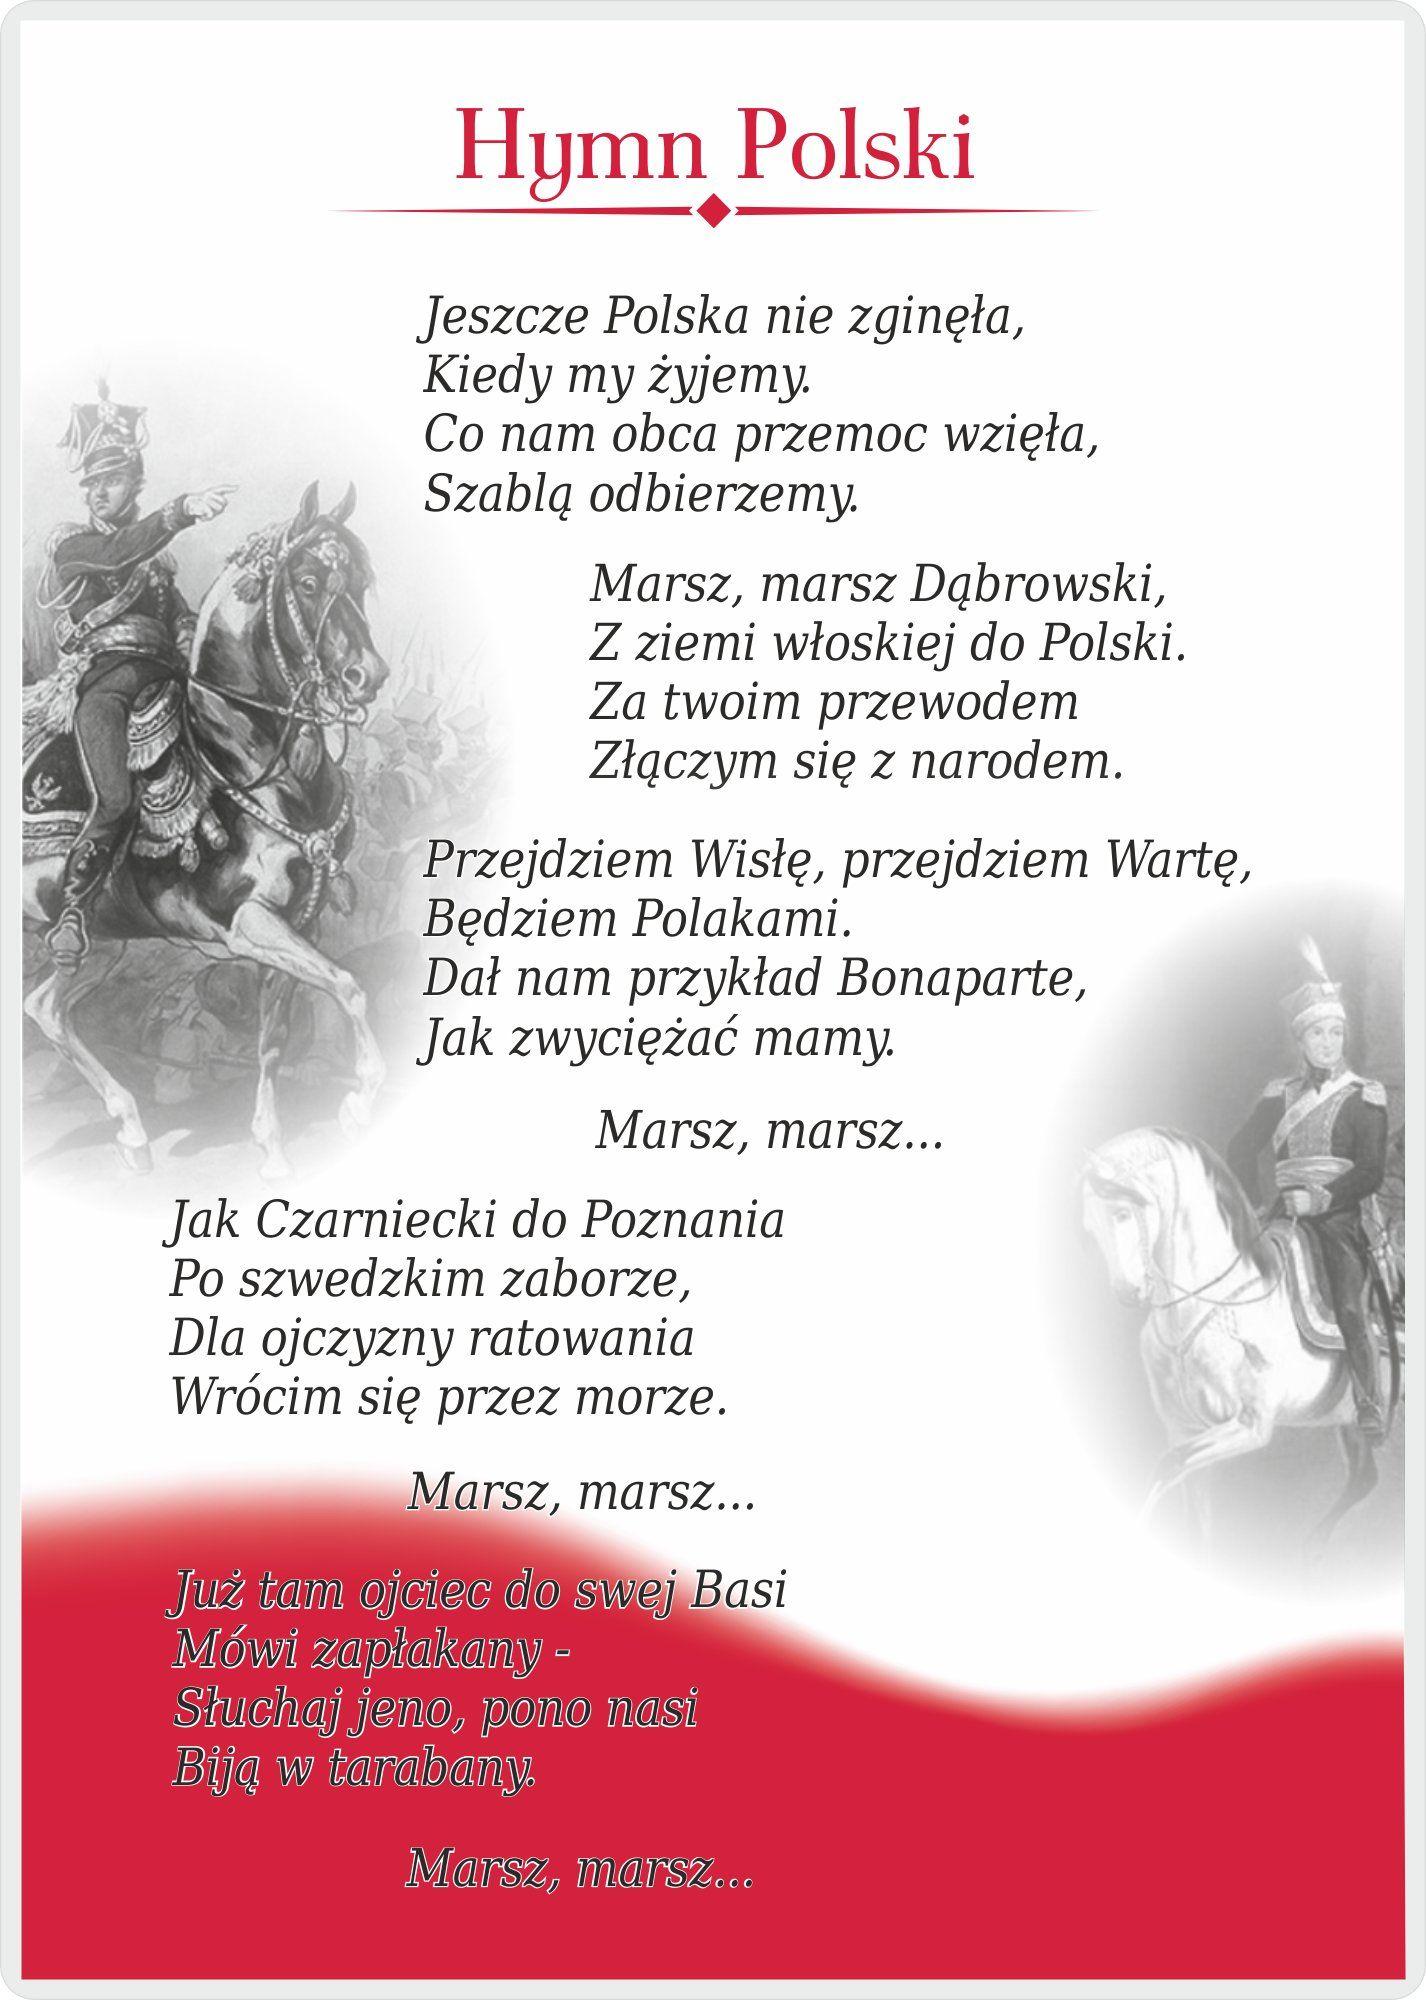 Kup Teraz Na Allegro Pl Za 4 00 Zl Edutab Hymn Polski Tablica Edukacyjna A4 6997264043 Allegro Pl Radosc Za Polish Language Polish Ancestry Learn Polish